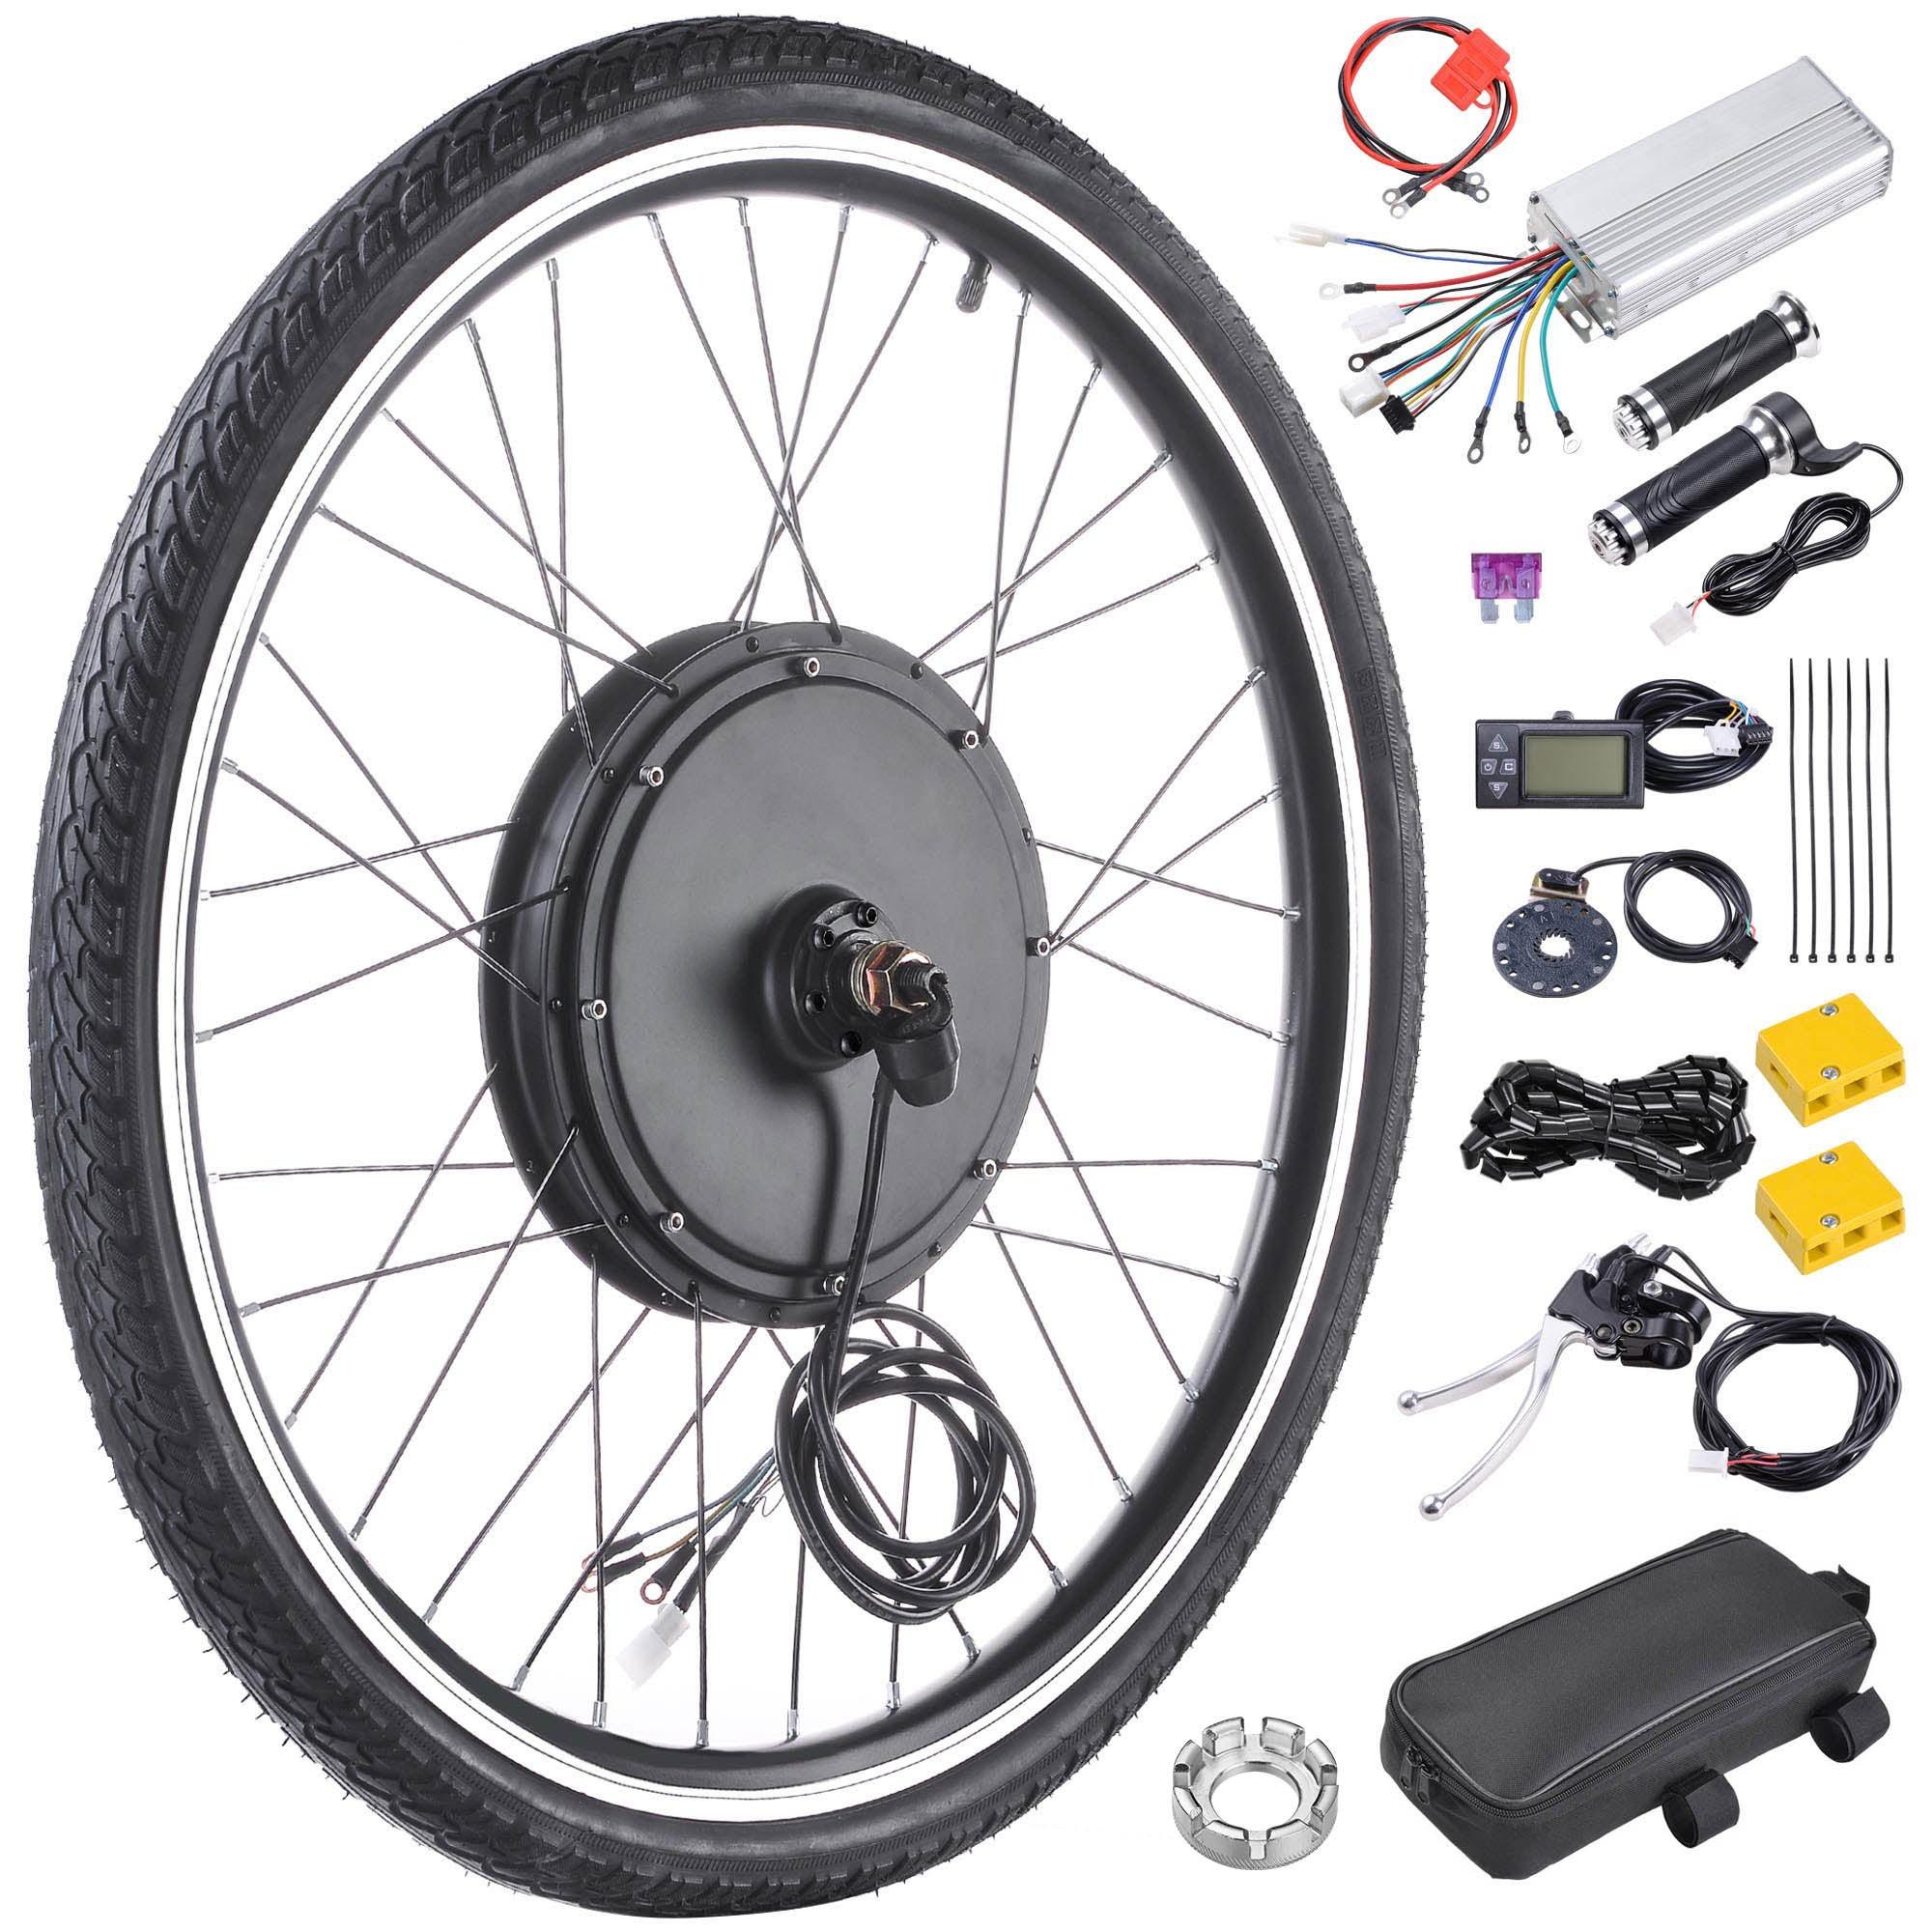 "Yescom 36V 750W Motor 26"" Front Wheel Electric Bicycle Kit E-Bike PAS Hub LCD Display"